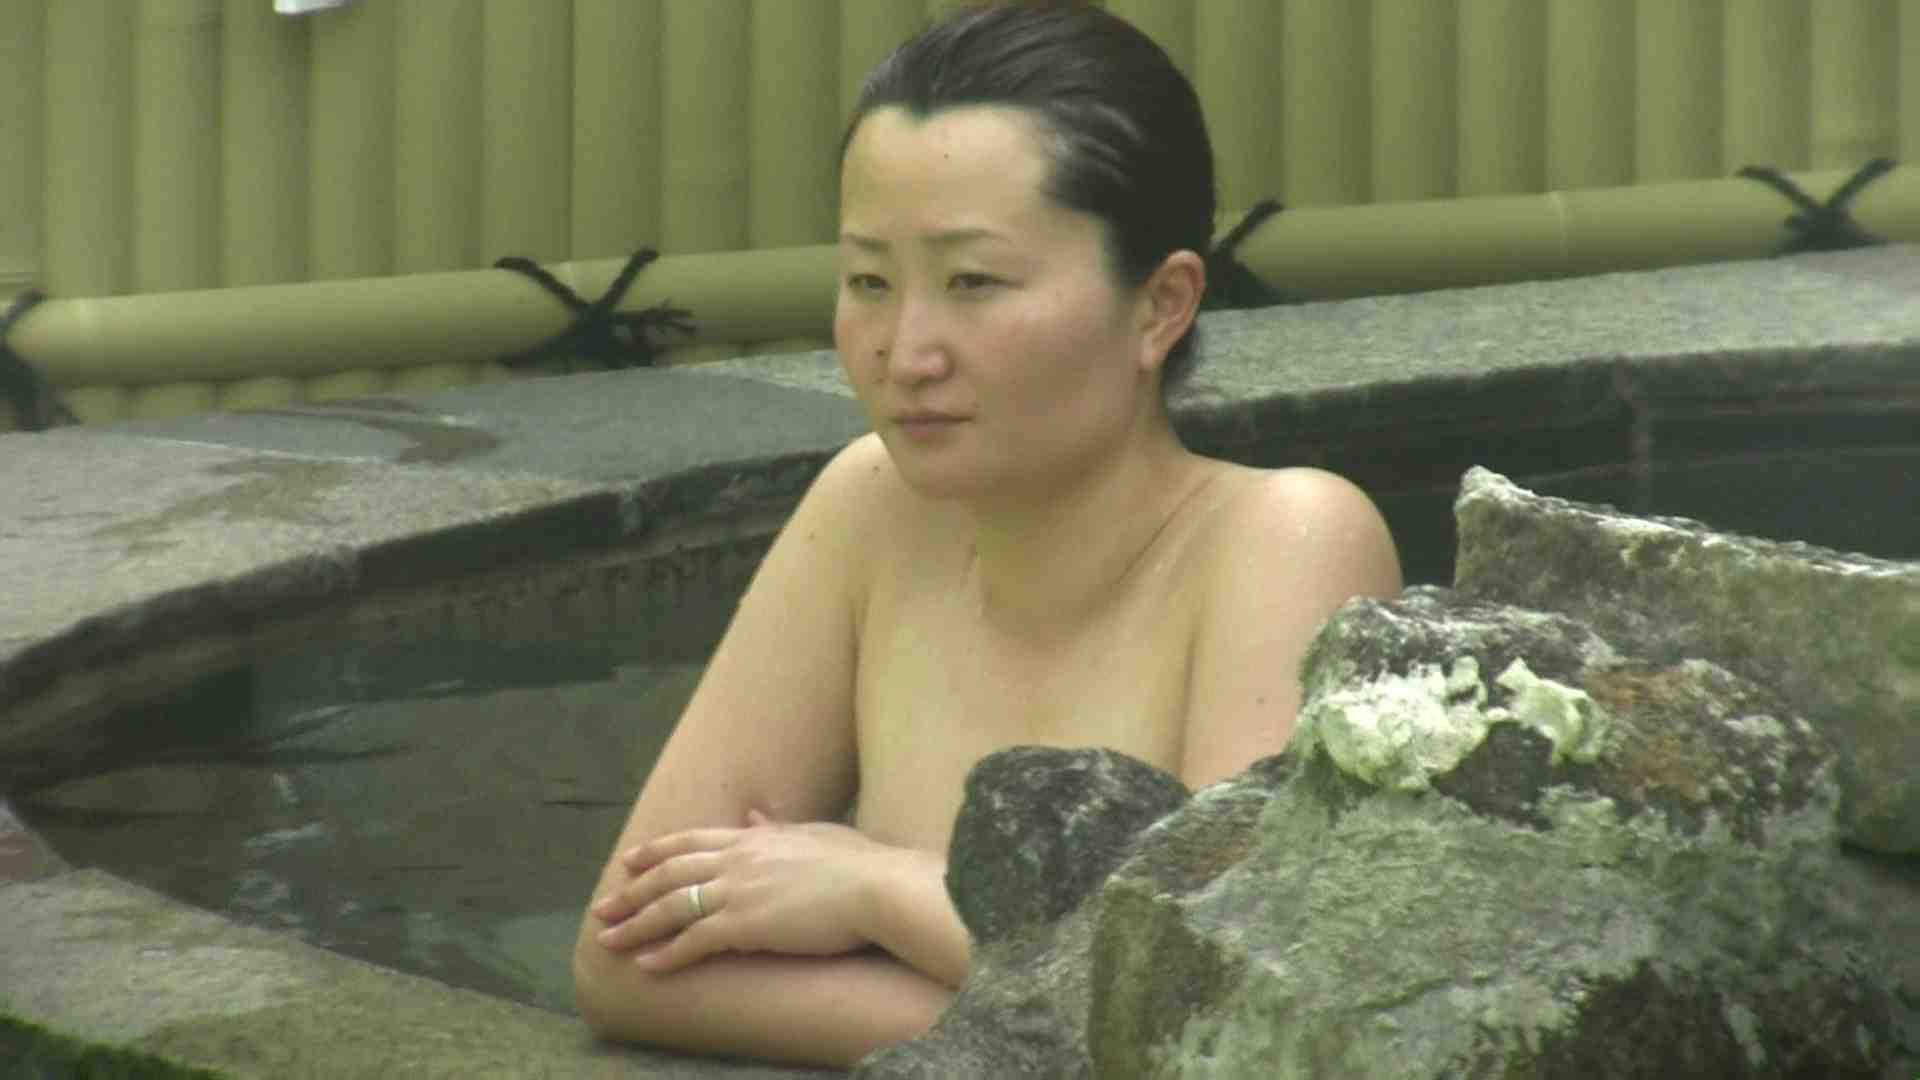 Aquaな露天風呂Vol.632 盗撮 | OLセックス  70画像 61